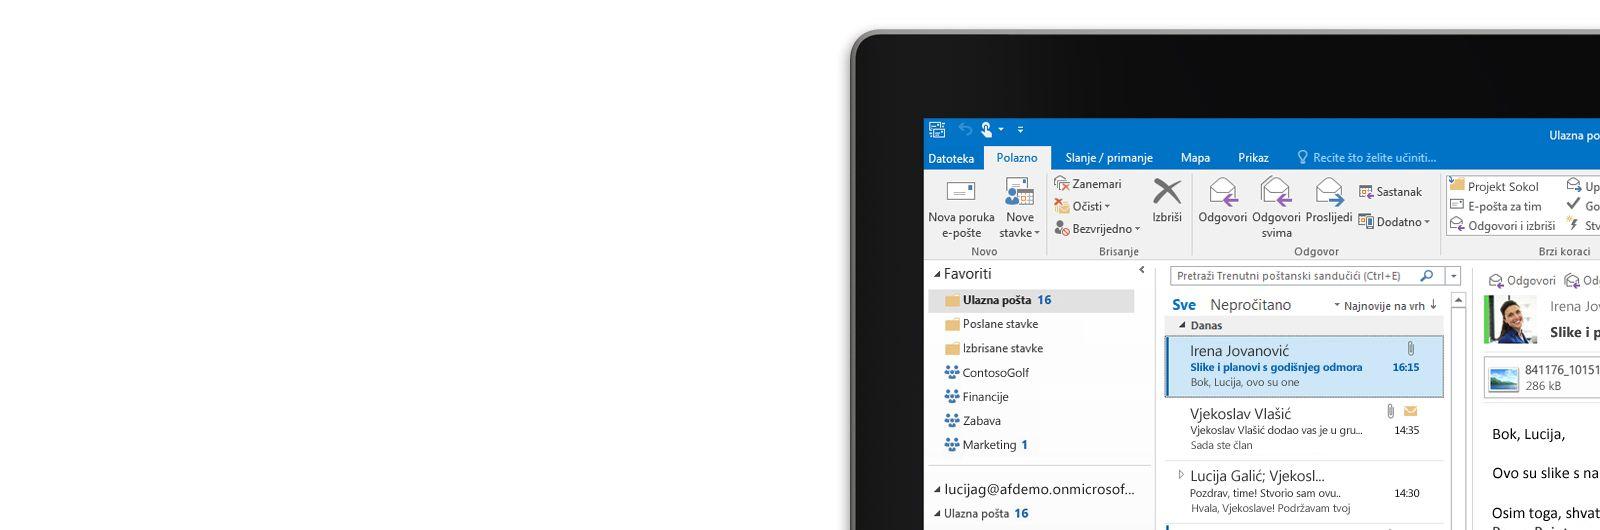 Tablet prikazuje ulaznu poštu programa Microsoft Outlook 2013 te popis i pretpregled poruka.